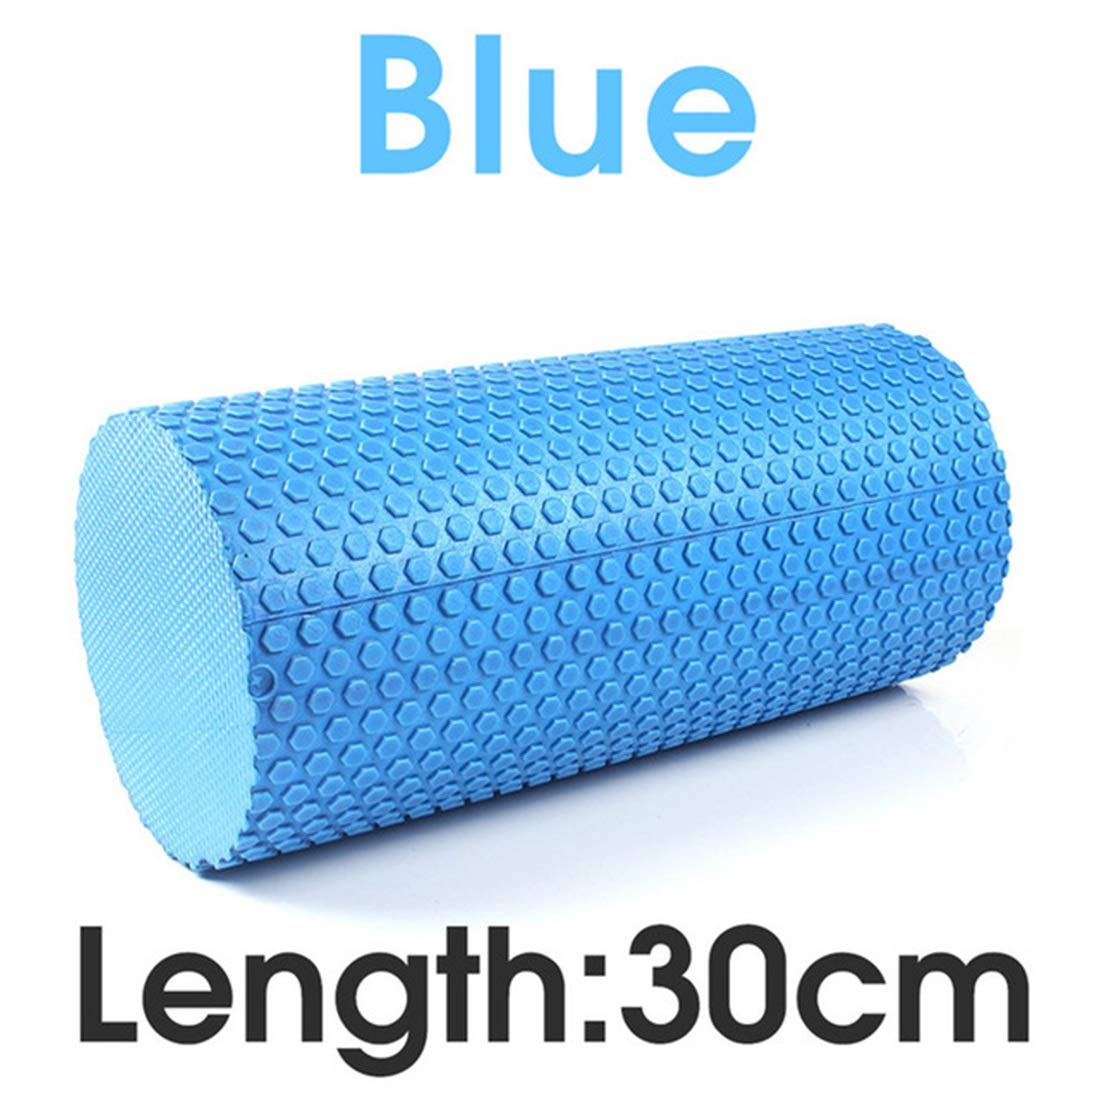 Ovesuxle Yoga Fitnessgeräte Eva Schaumroller Pilates Fitness Gym Übungen Physio Massage 30/45 cm Dia 15 cm